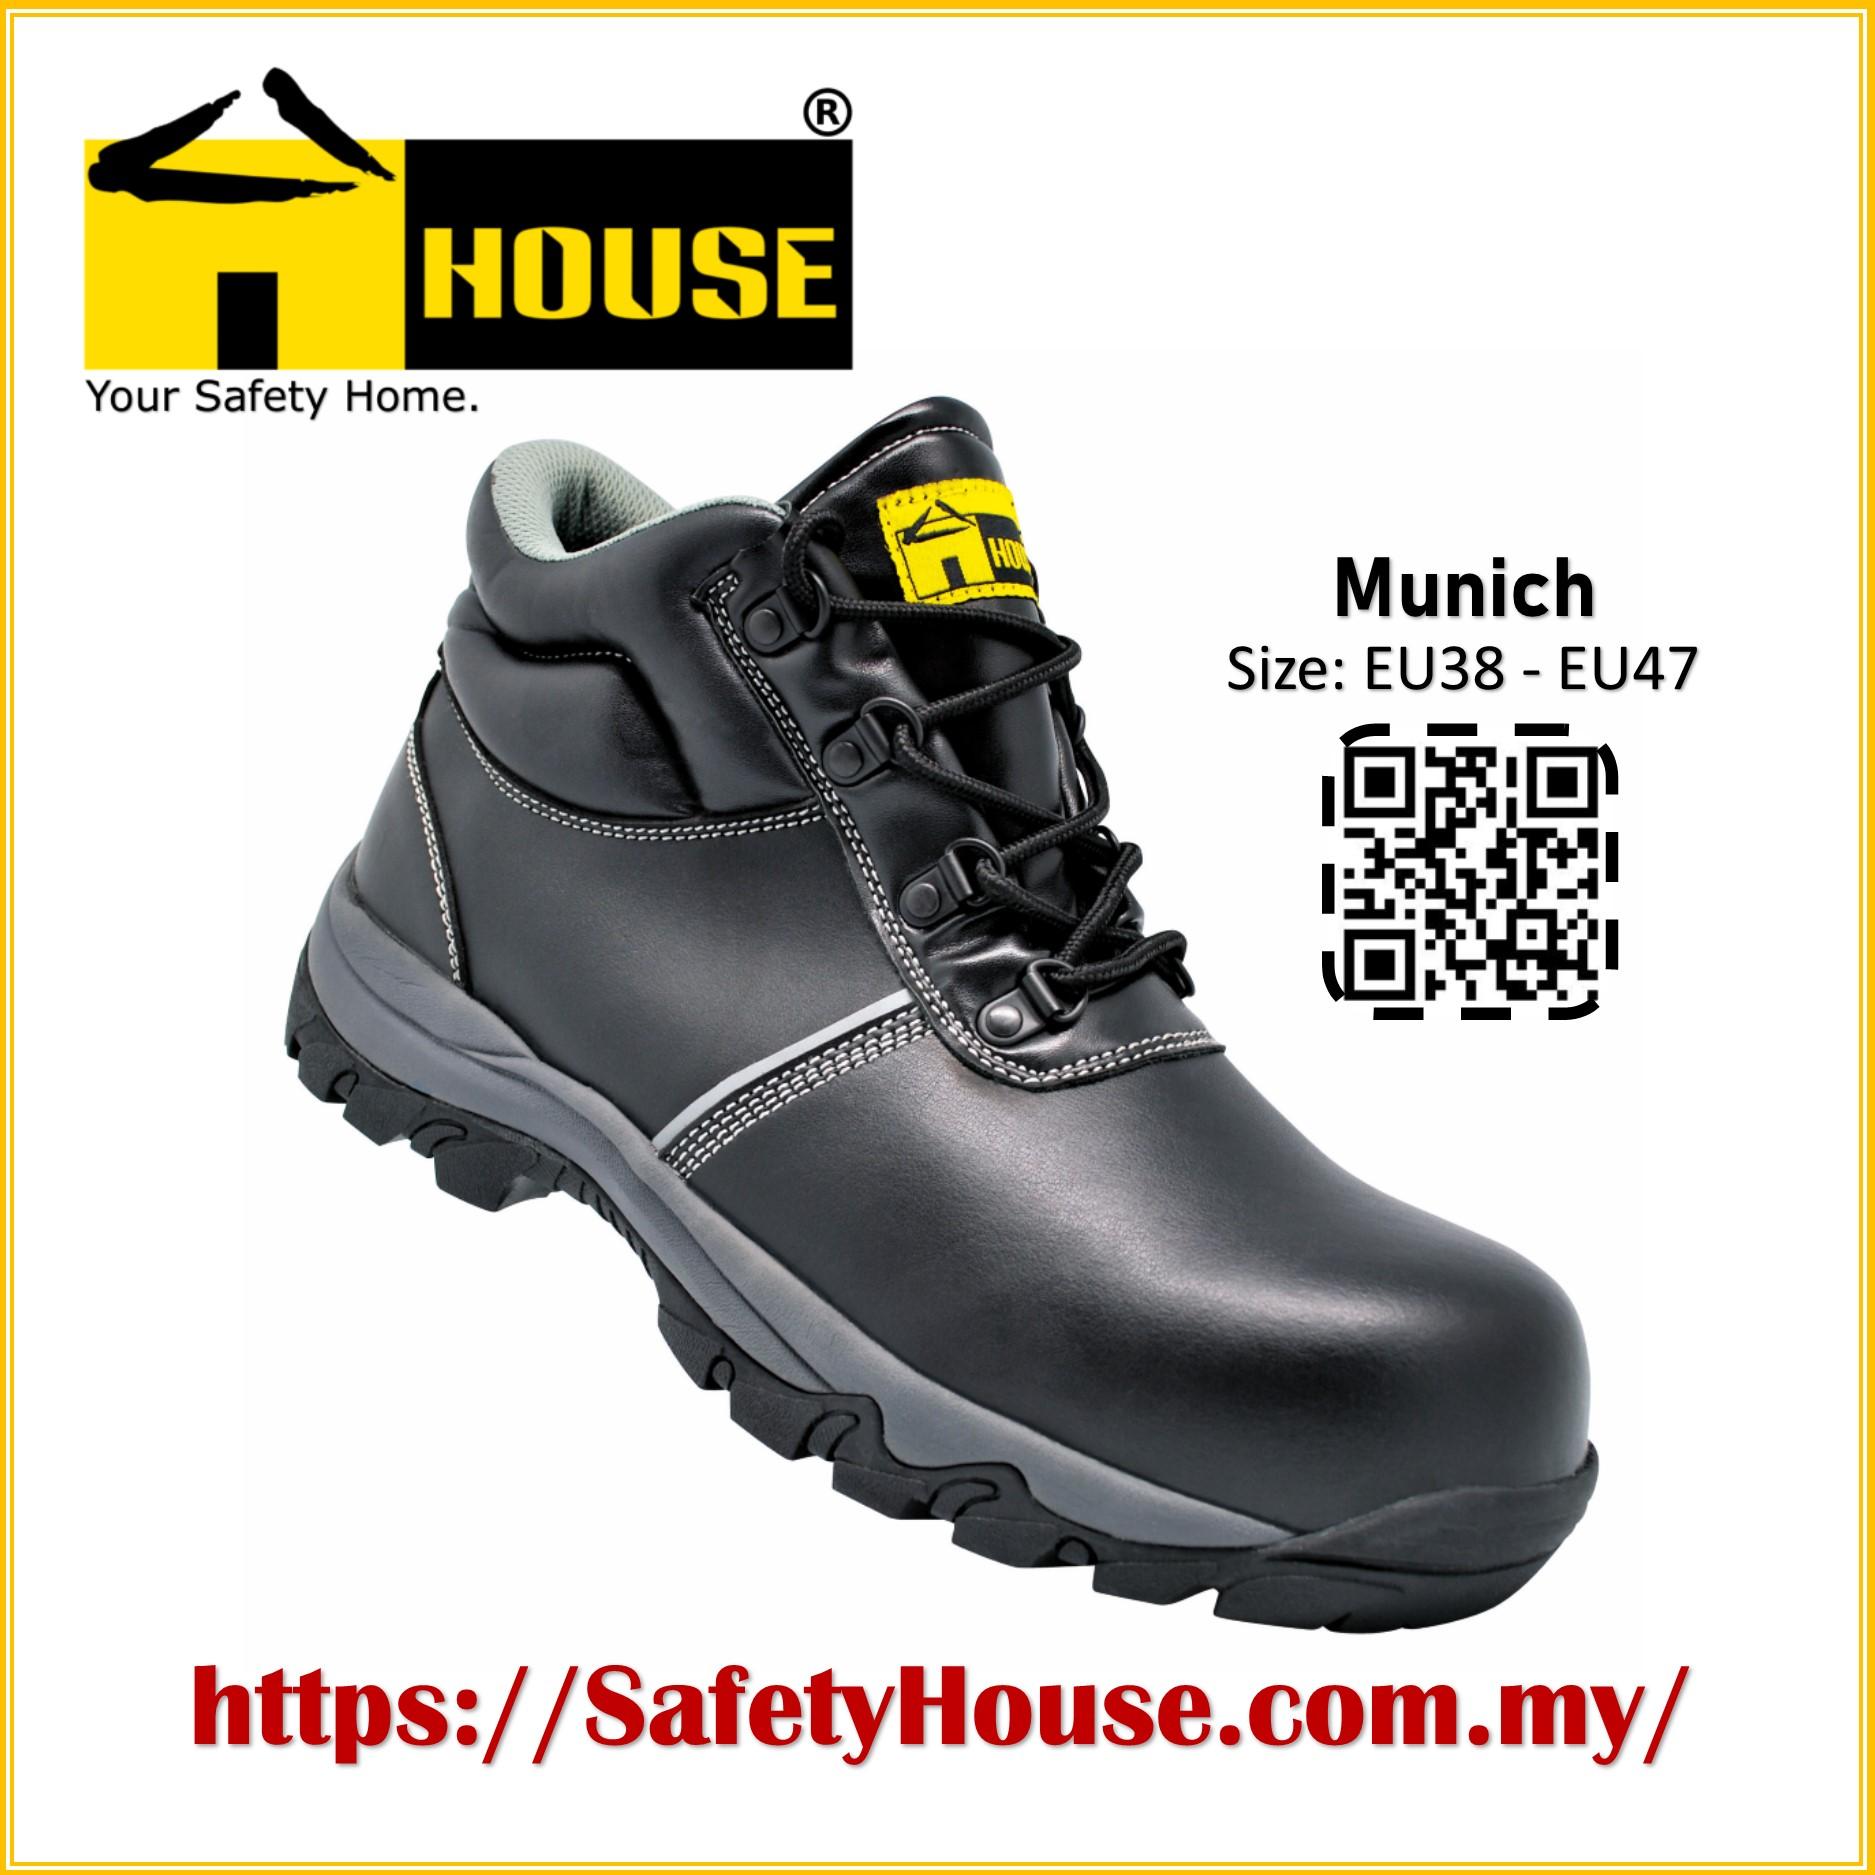 HOUSE MUNICH SAFETY SHOES C/W COMPOSITE TOE CAP & ARAMID MID SOLE Image